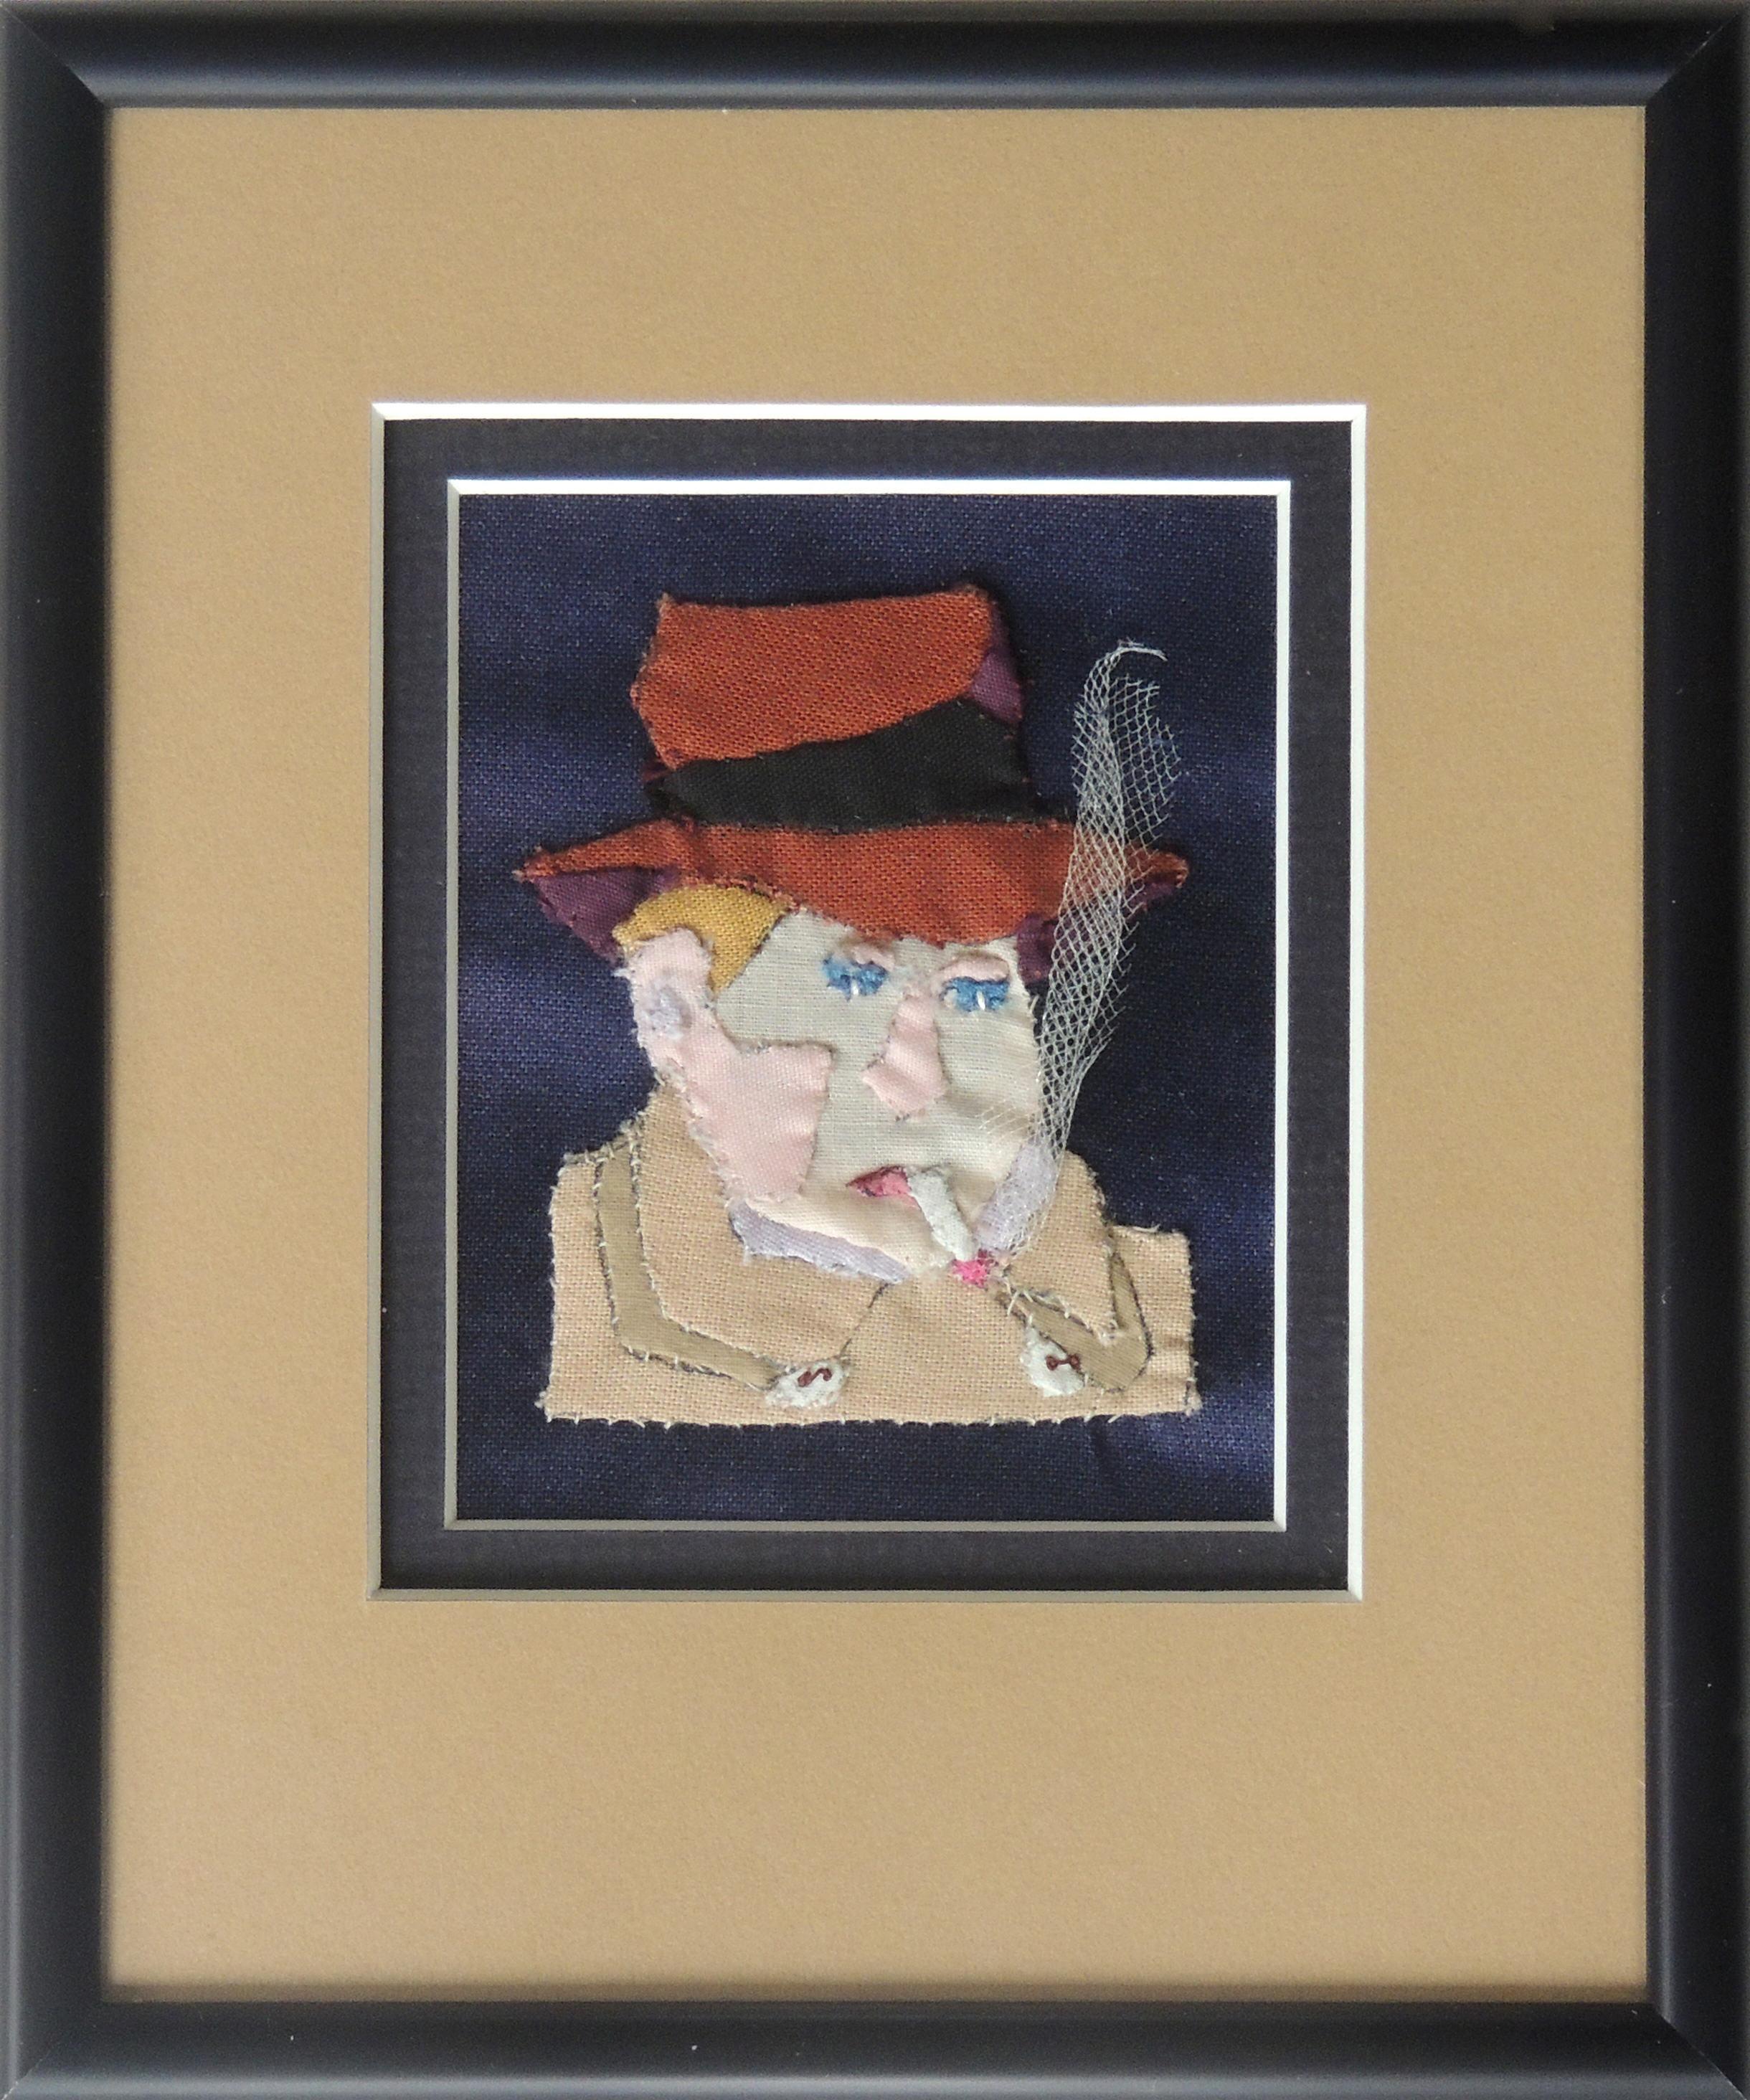 "Marianne Rabb Britton | BROWN FEDORA | Fabric & Embroidery | 7 x 6"" | Estate of Marianne Rabb Britton"